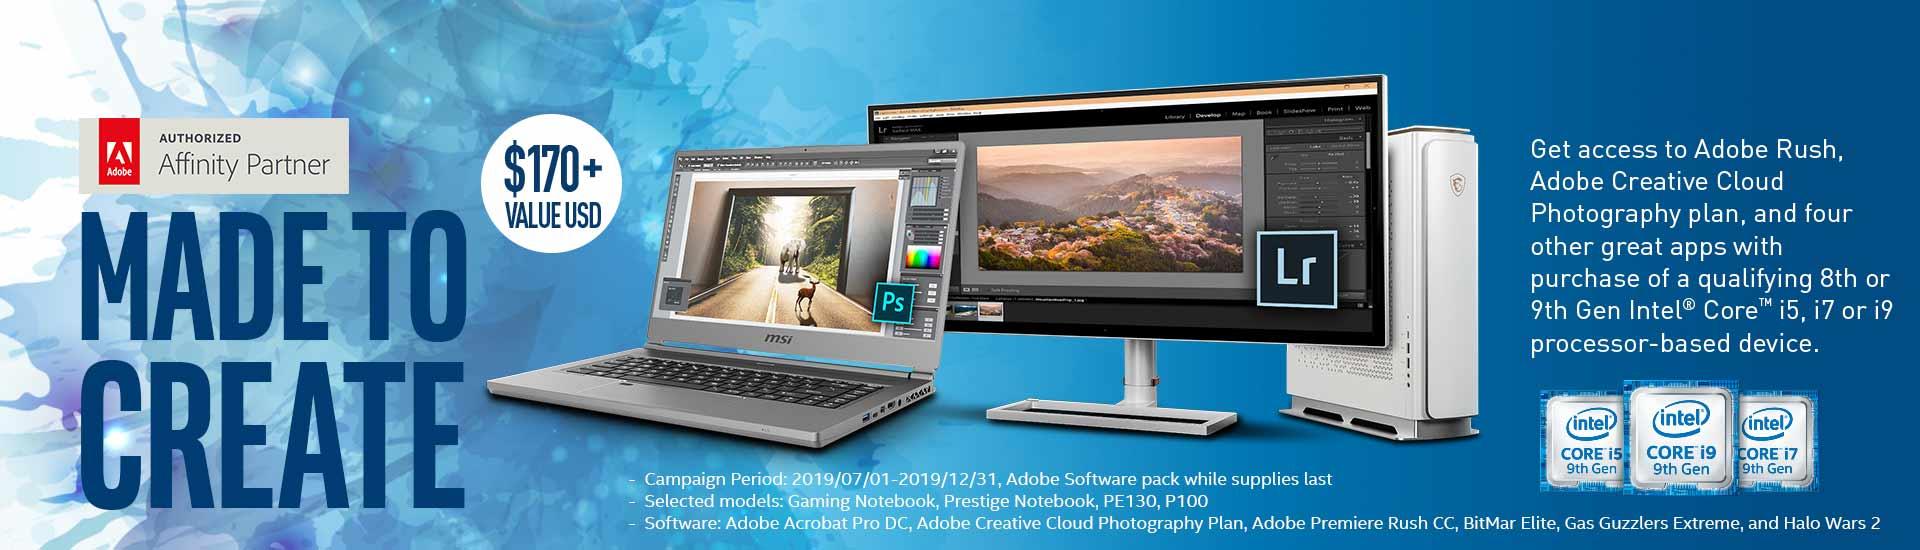 Intel Adobe